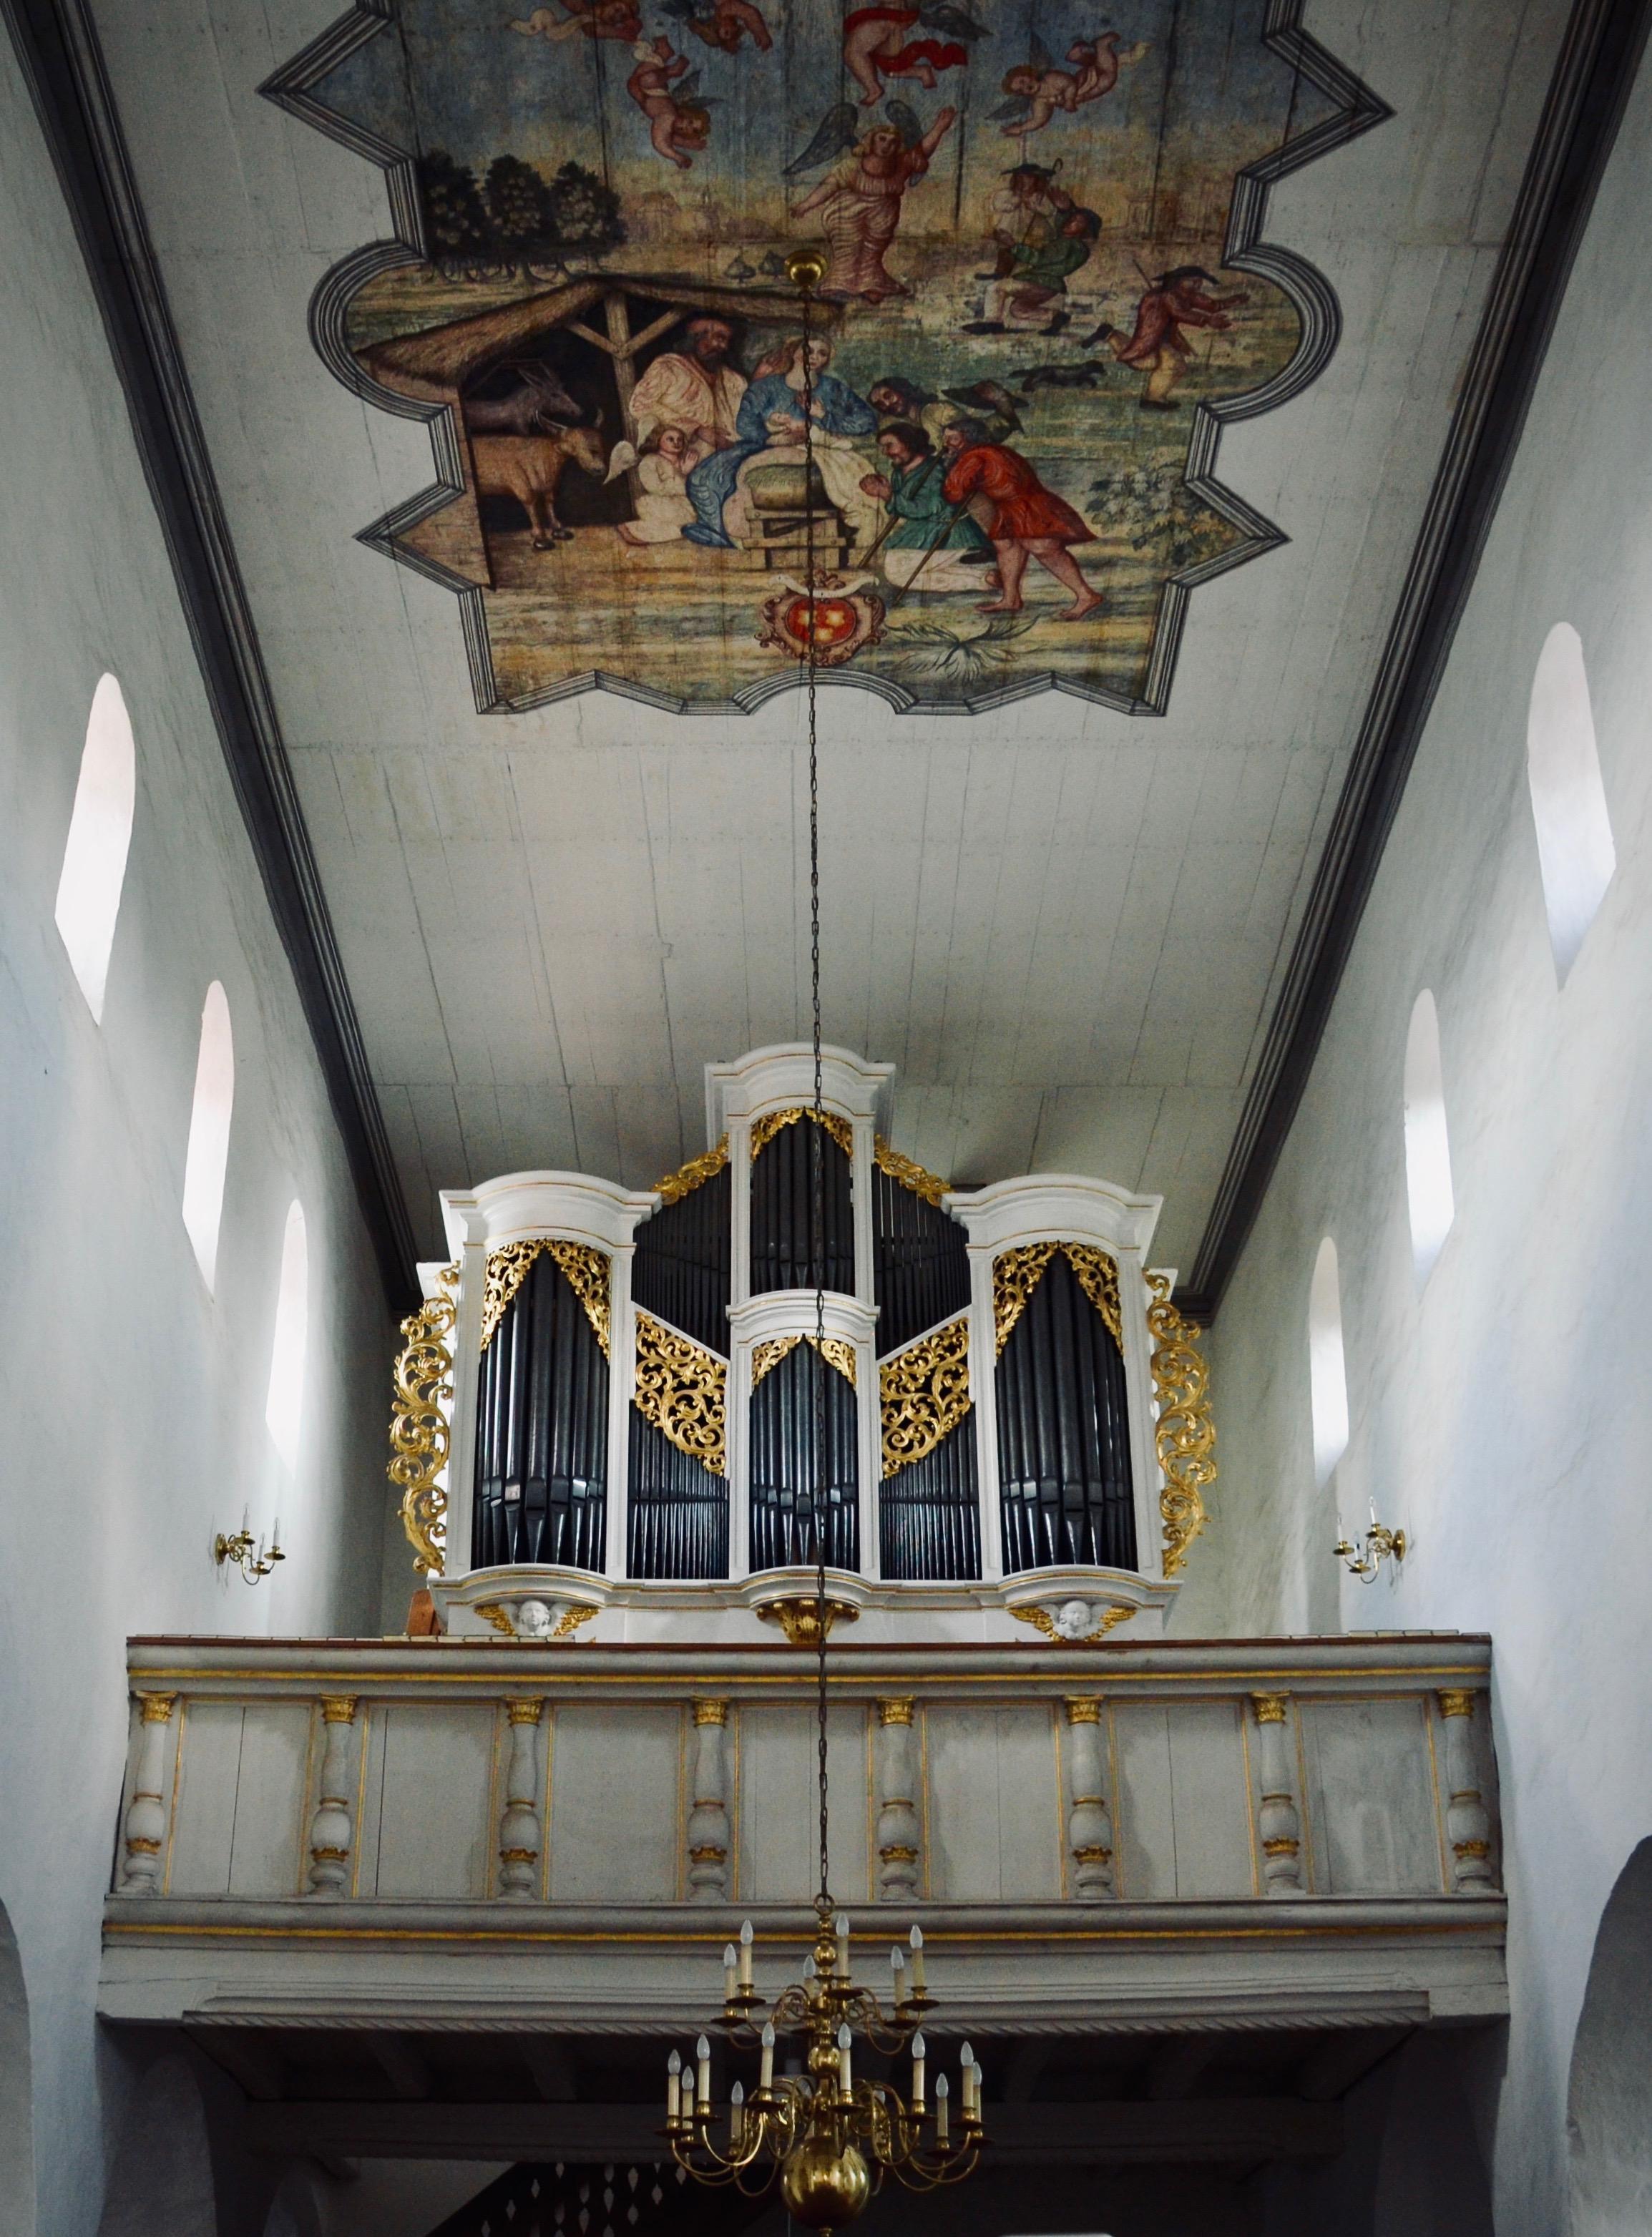 1722 Gottfried Silbermann Organ, Killianskirche, Bad Lausick